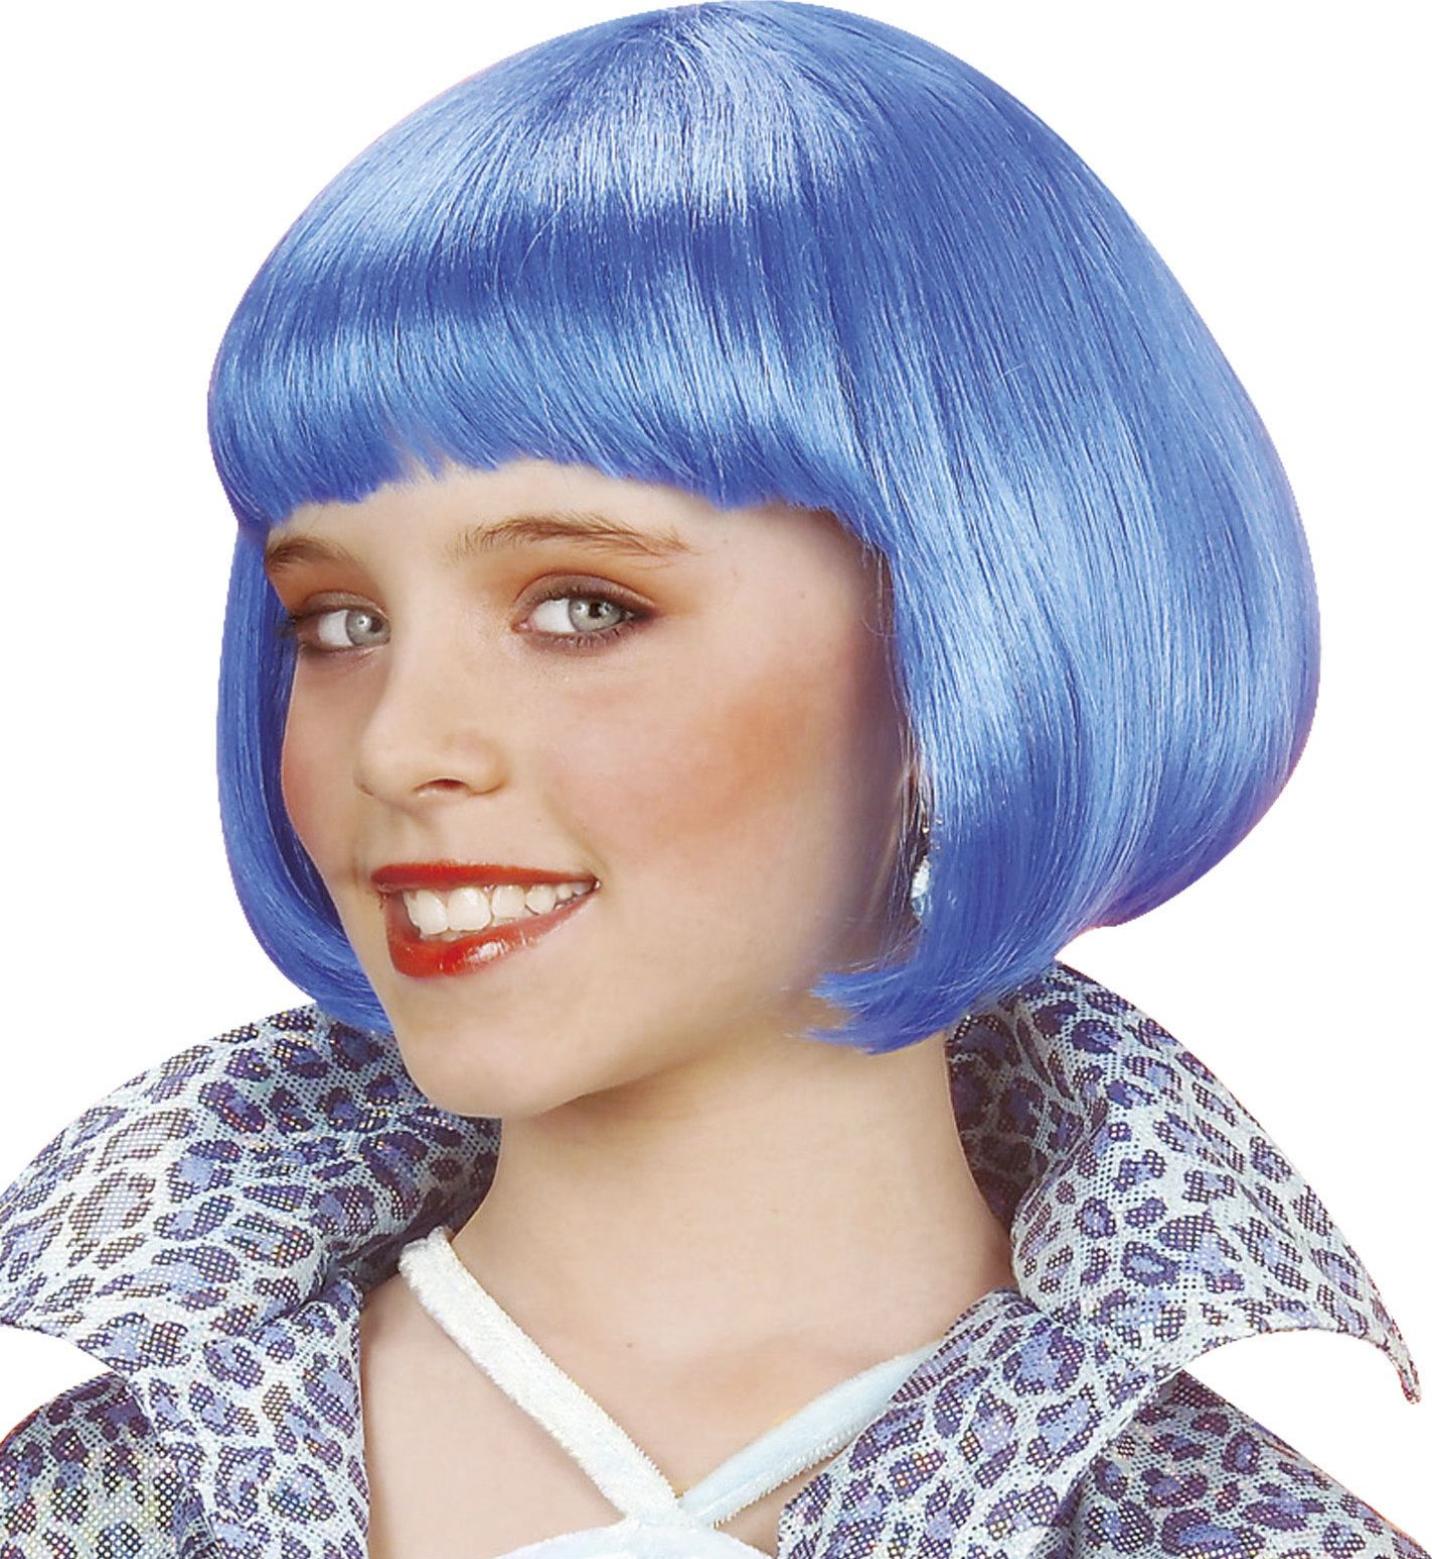 Blauwe Jenny pruik kind